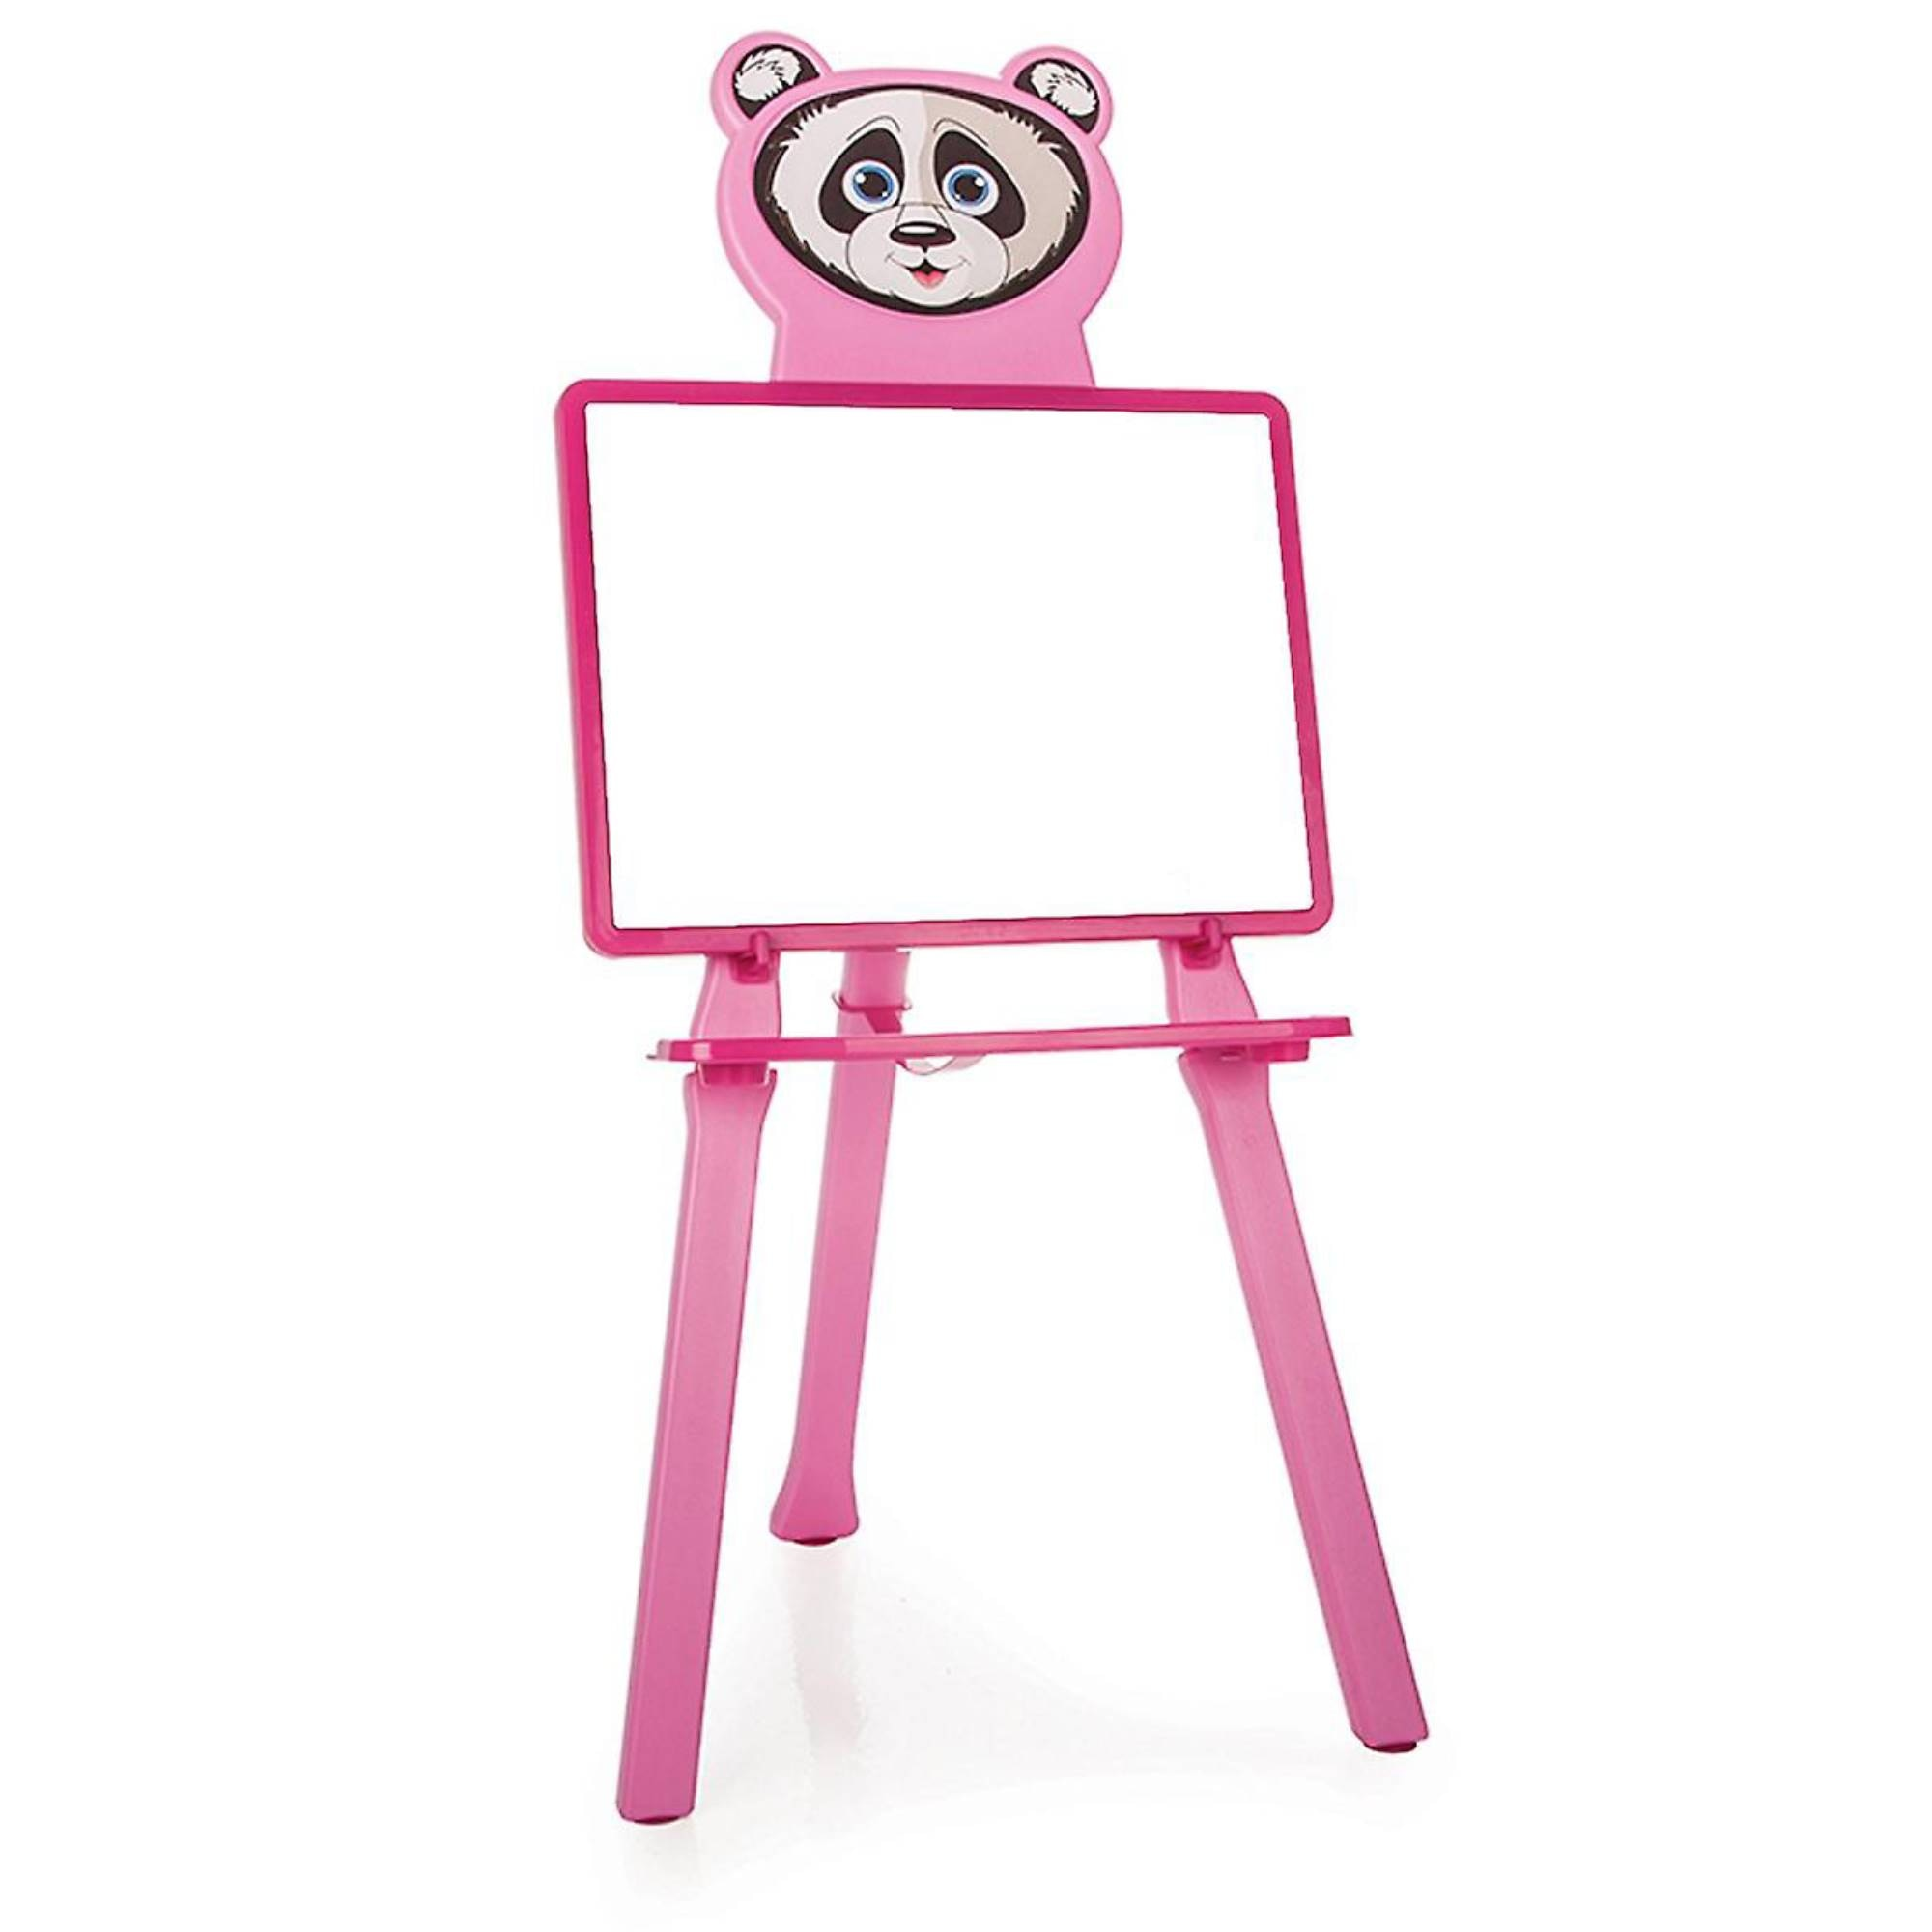 Fotografie Tablita pentru desen Pilsan - Panda, roz